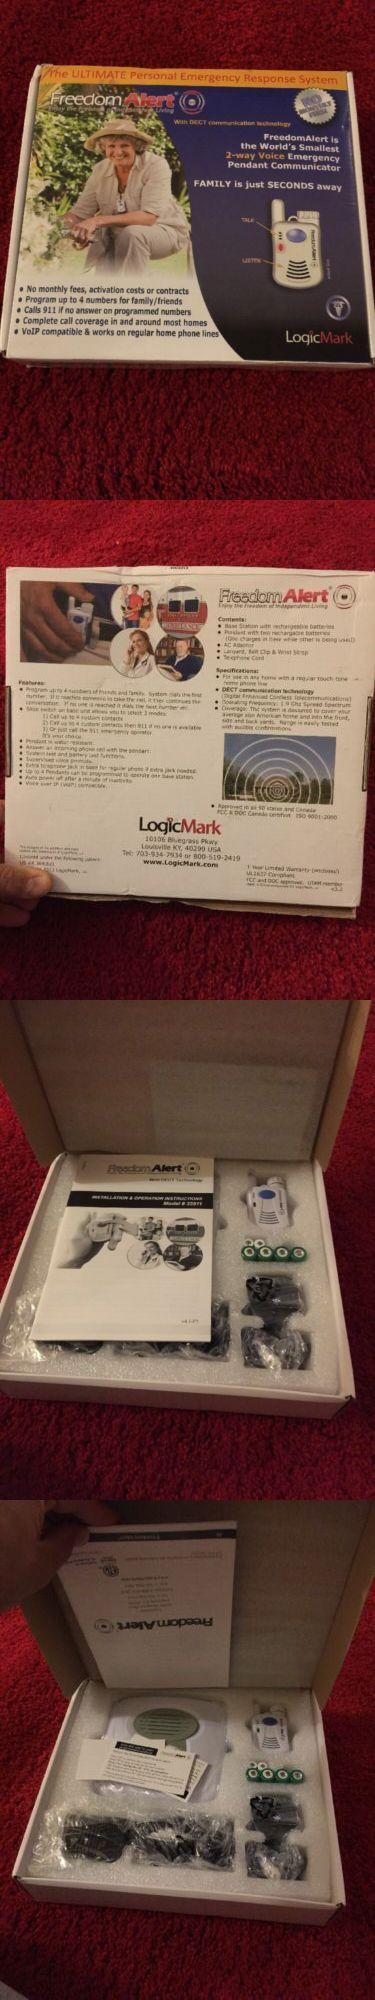 Emergency Alert Systems: Logicmark Freedom Alert Emergency Alert System - No Activation Or Mthly Fees -> BUY IT NOW ONLY: $155 on eBay!